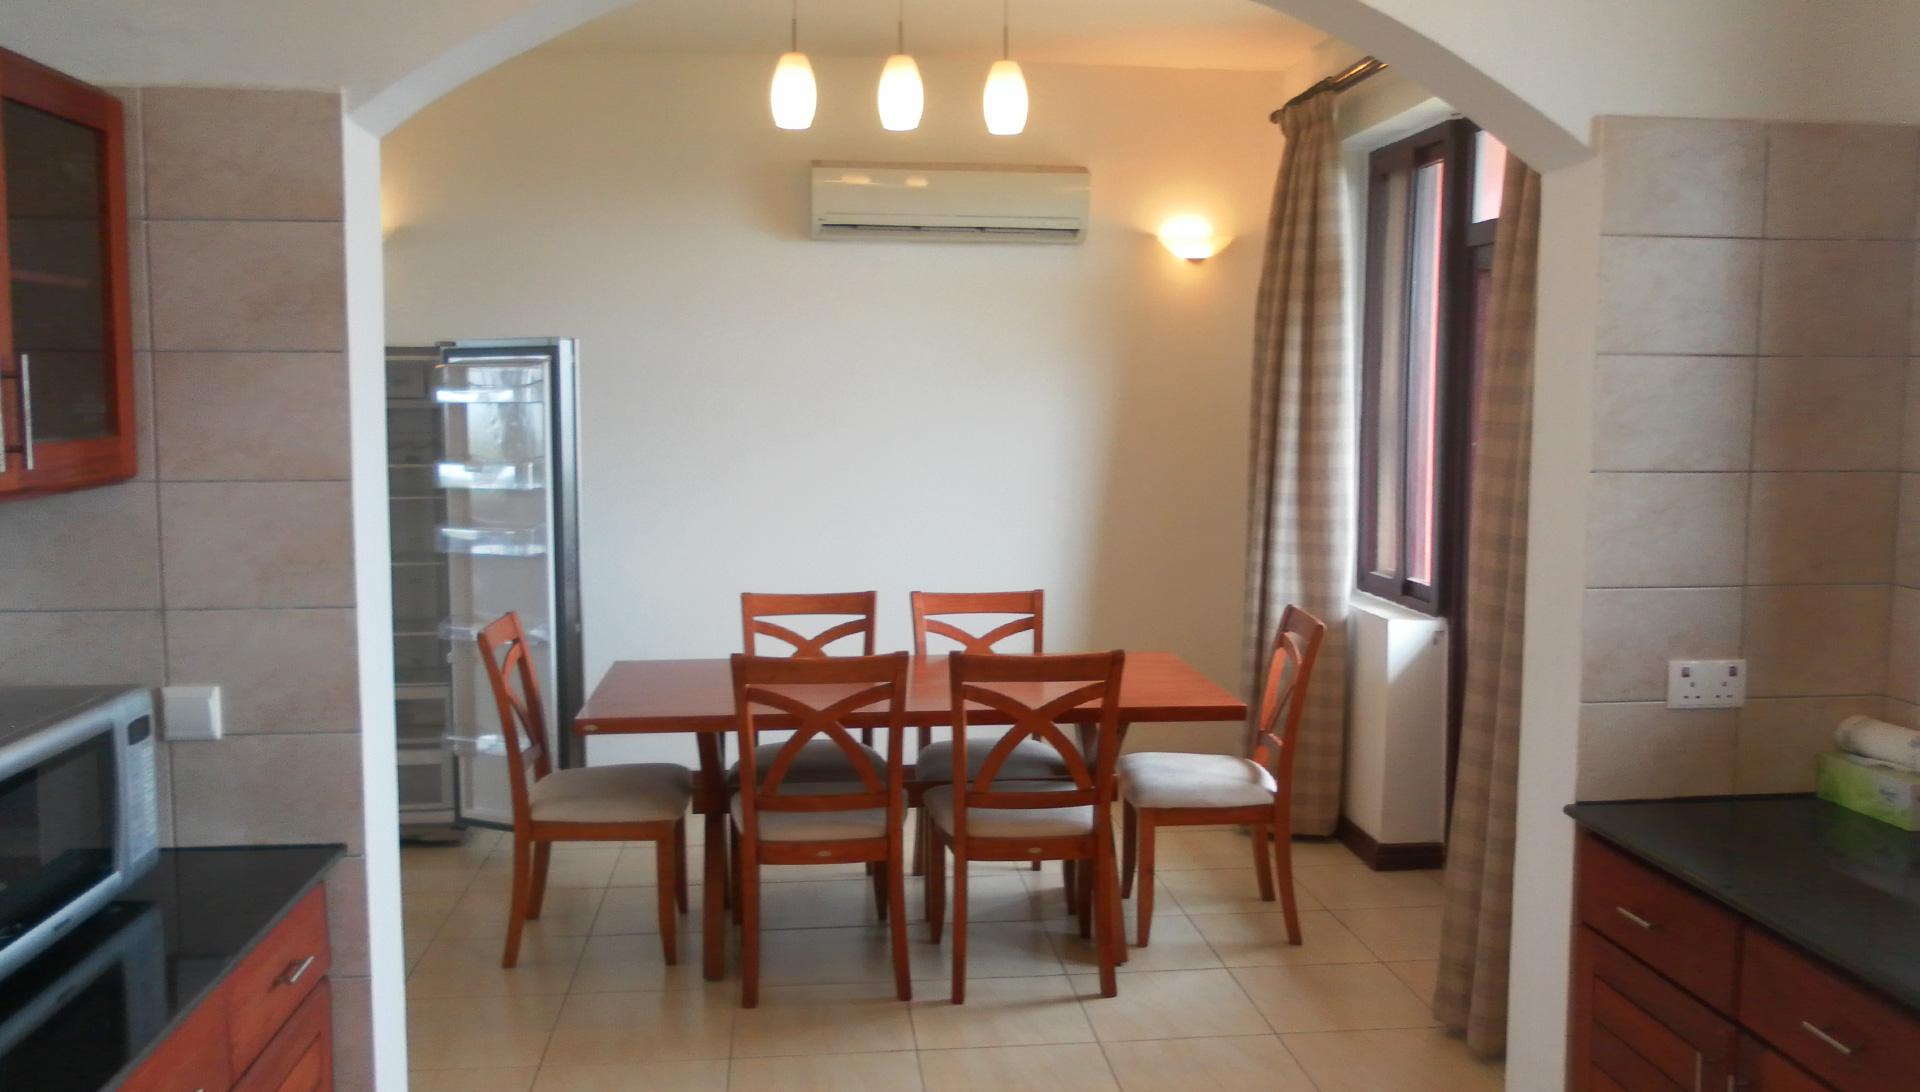 Modern 2 bedroom apartment for rent in Masaki